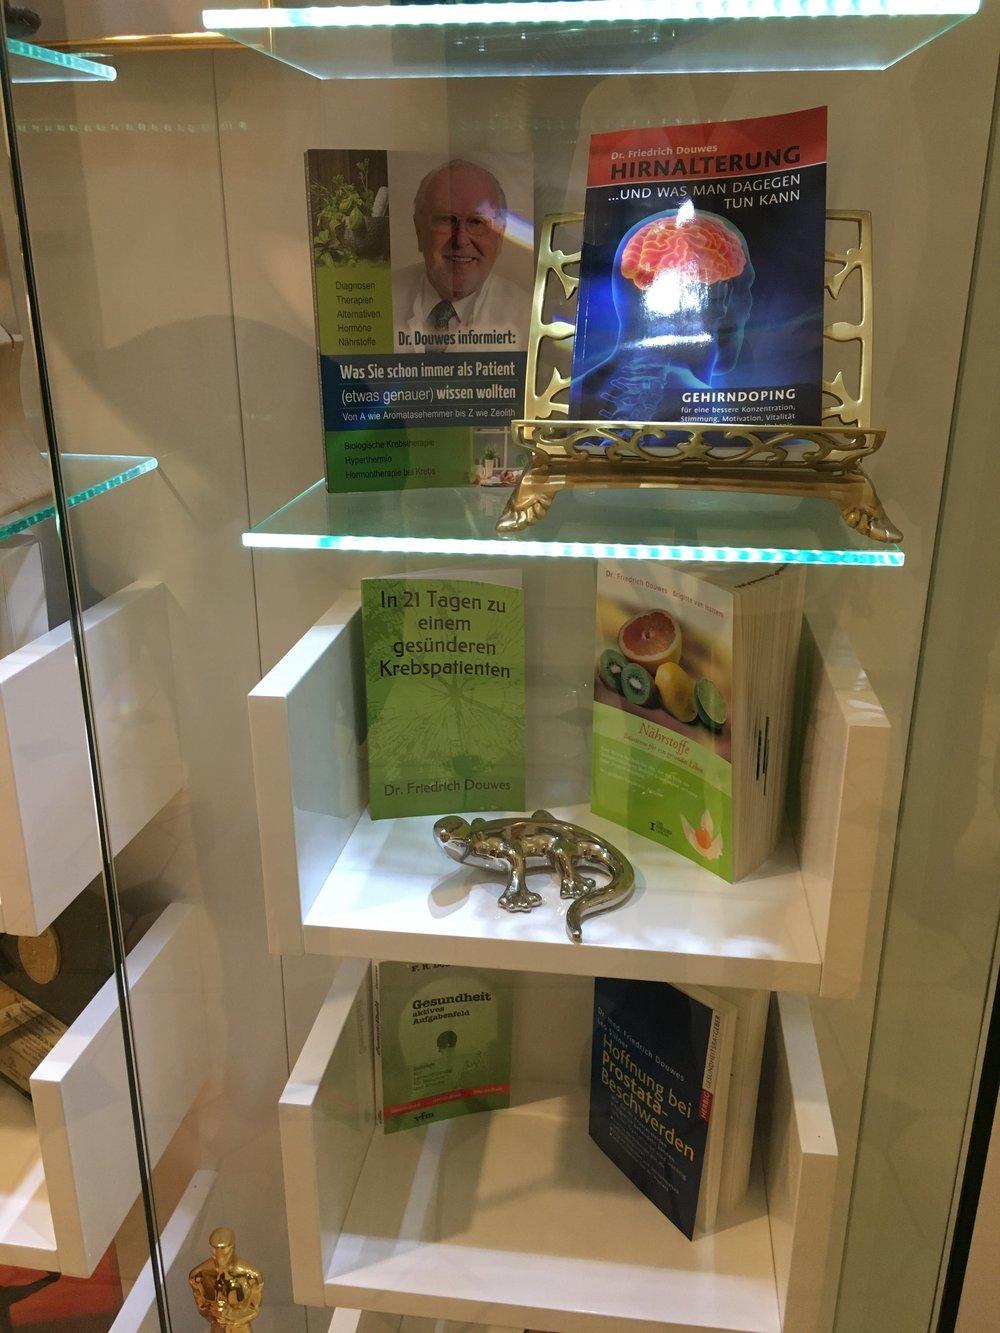 Dr. Friedrich Douwes' Books